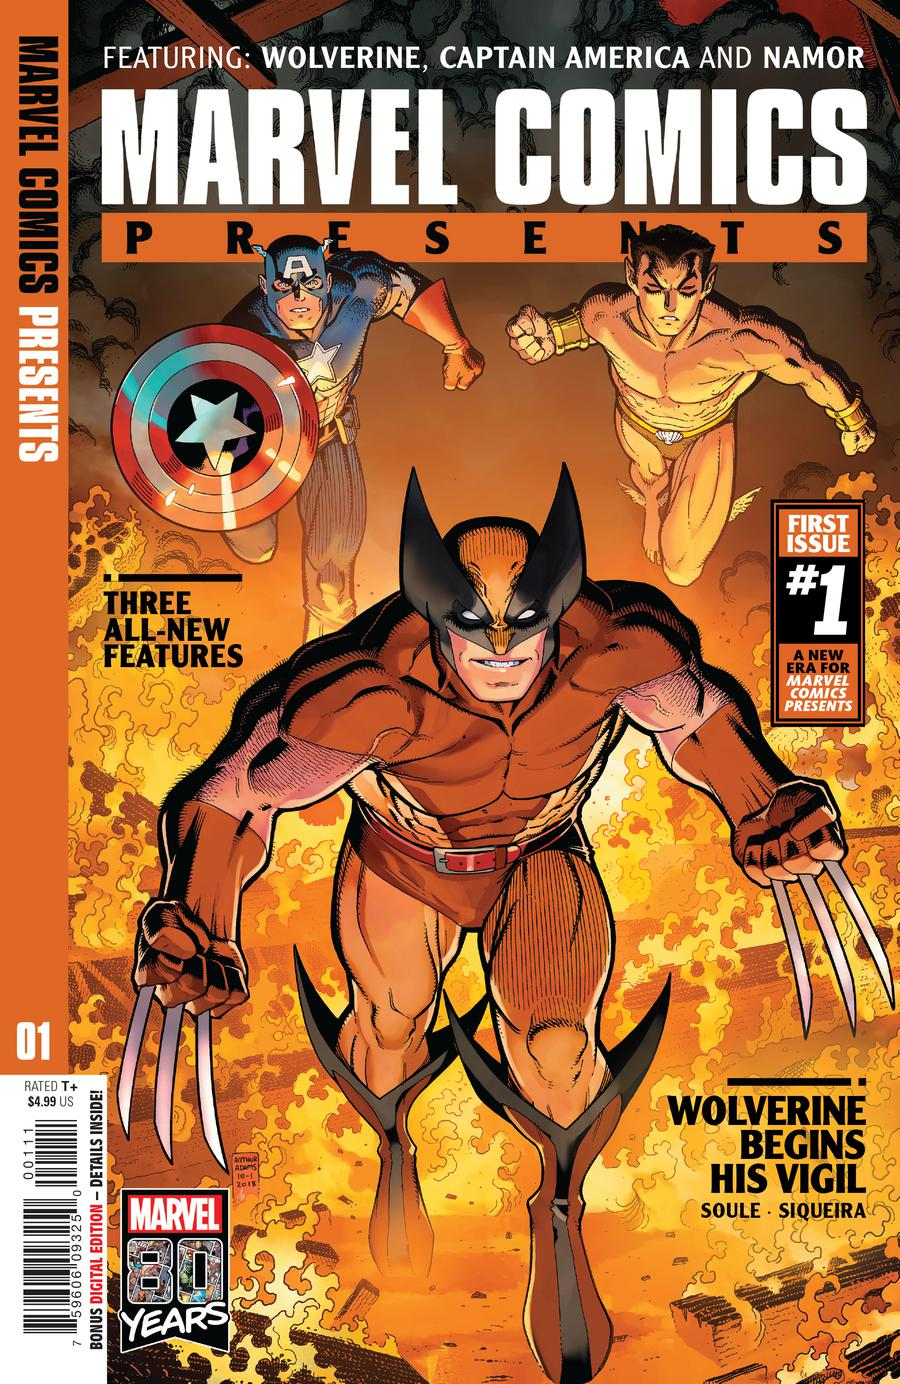 Marvel Comics Presents Vol 3 #1 Cover A 1st Ptg Regular Arthur Adams & Federico Blee Cover